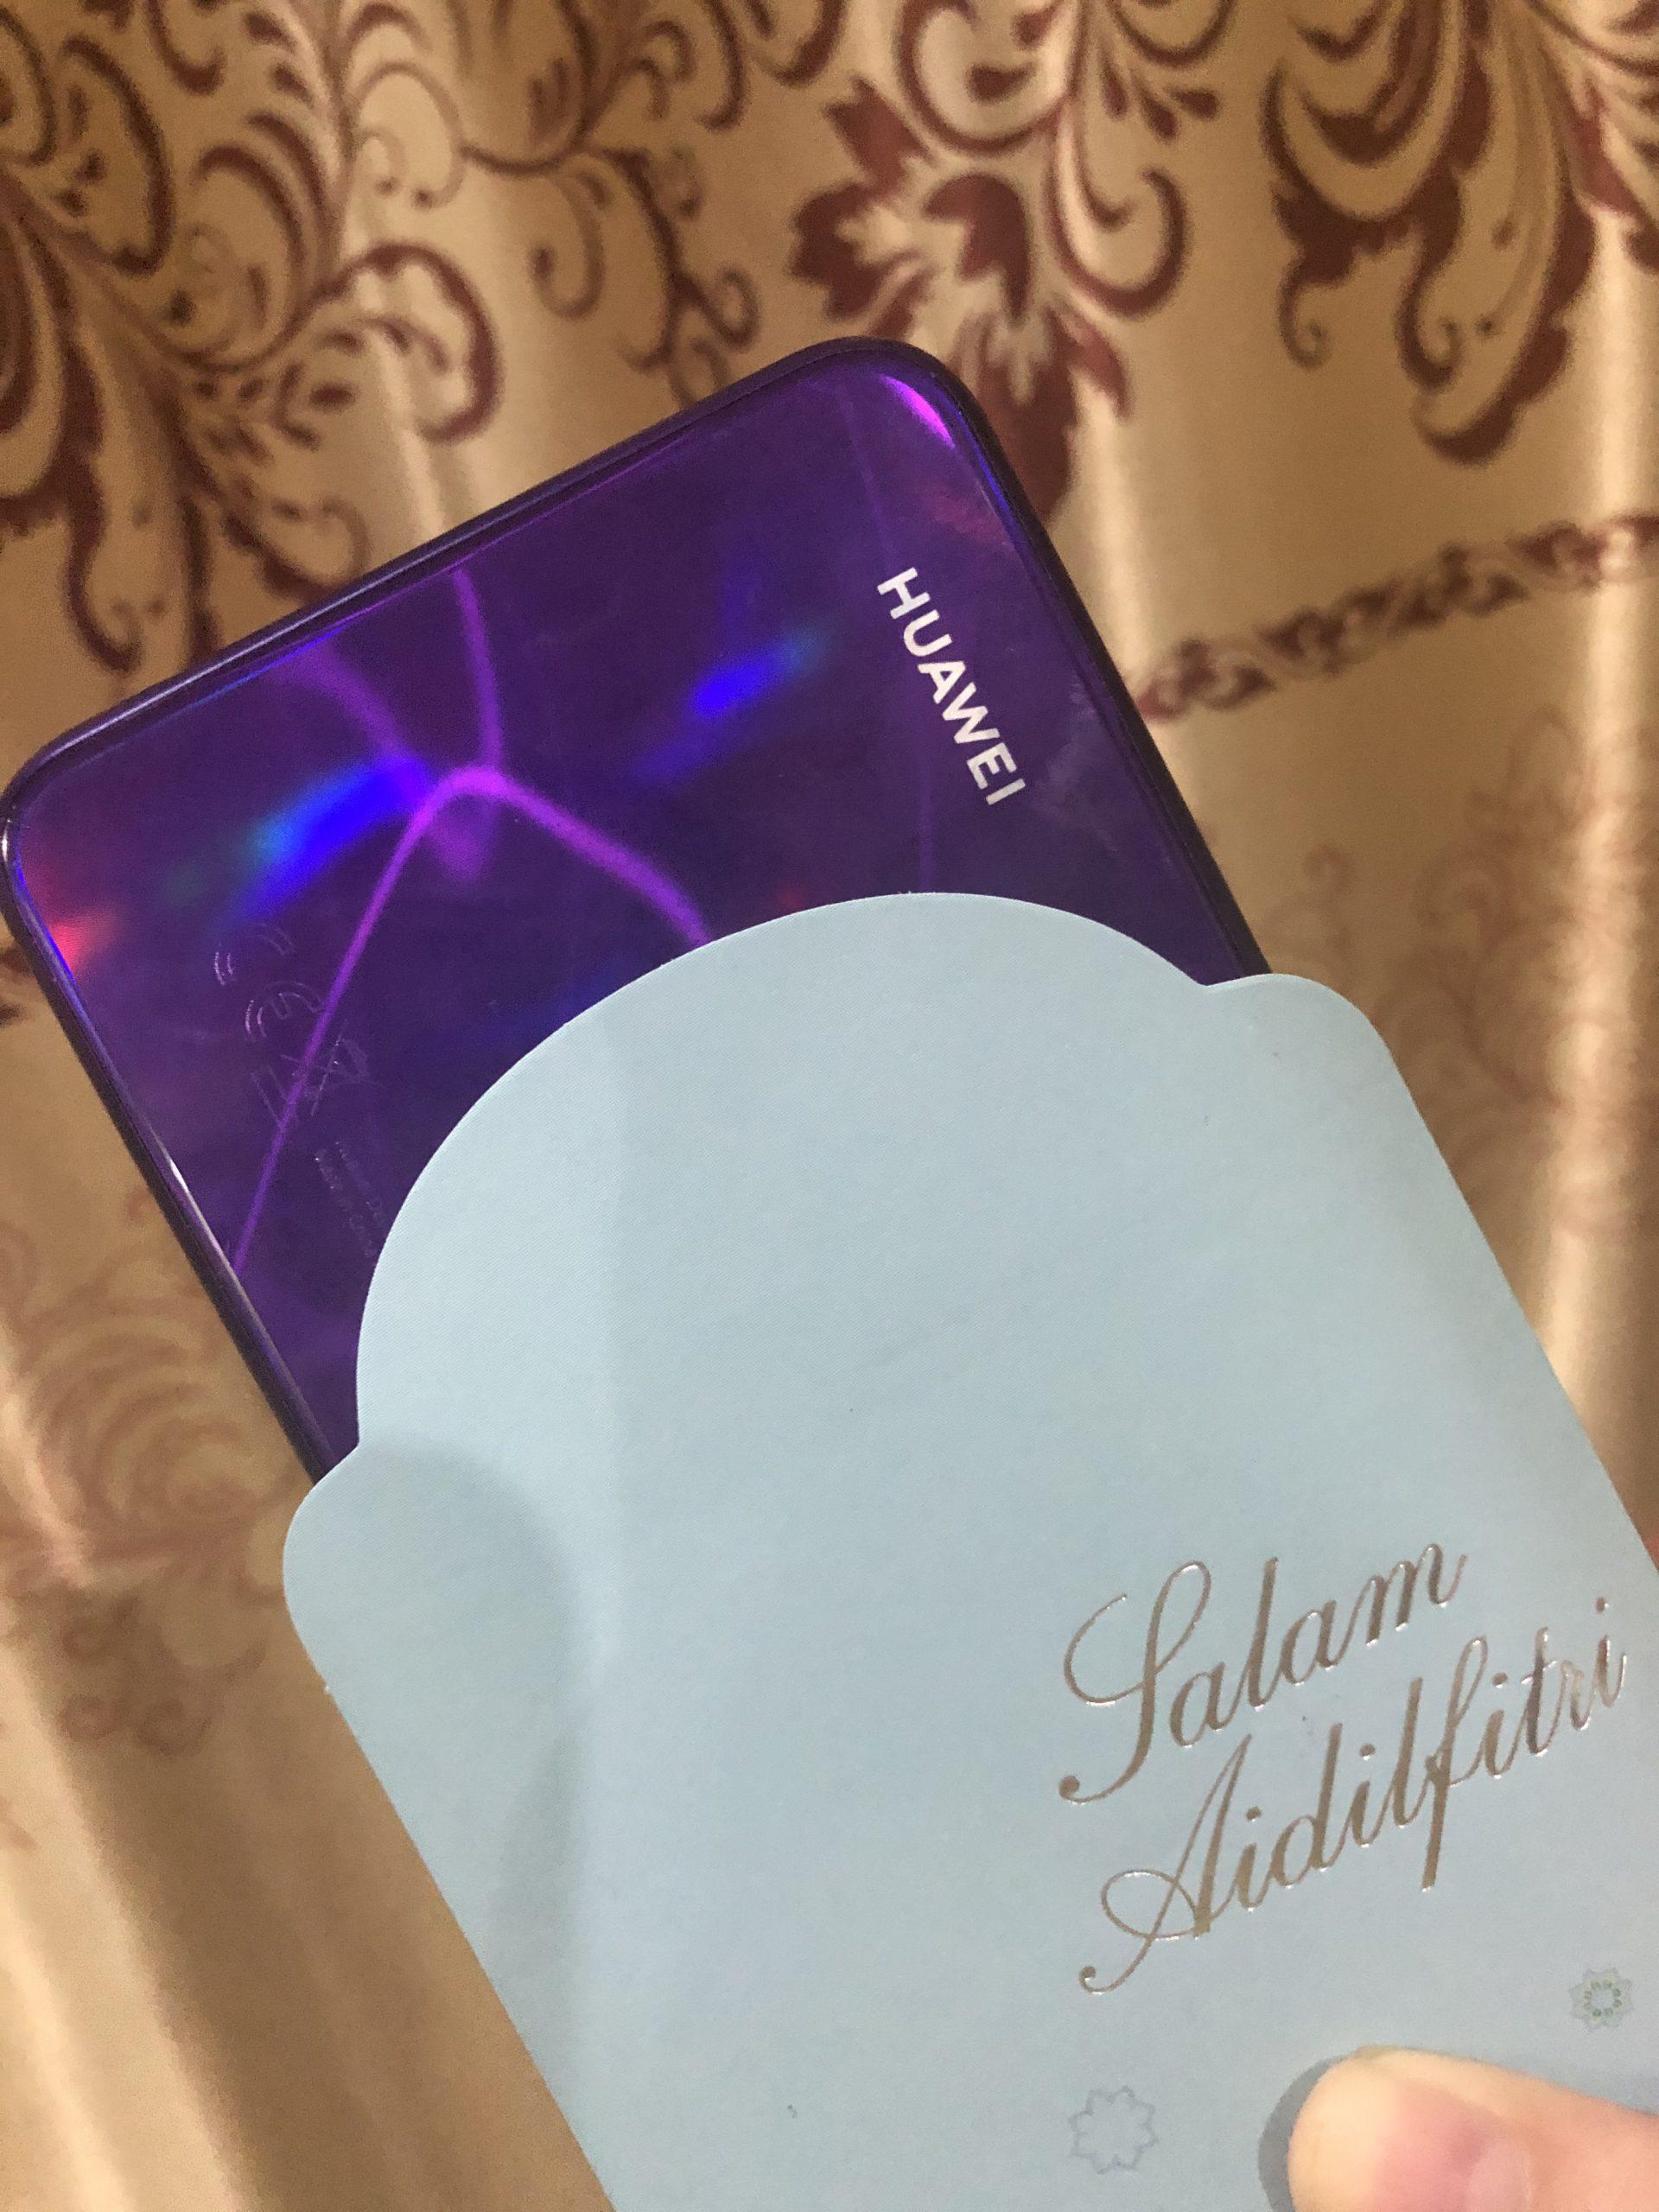 Raya Norma Baharu Bersama Huawei Y6p 'Skrin, Bateri Dan Gaya Besar' Hanya RM559